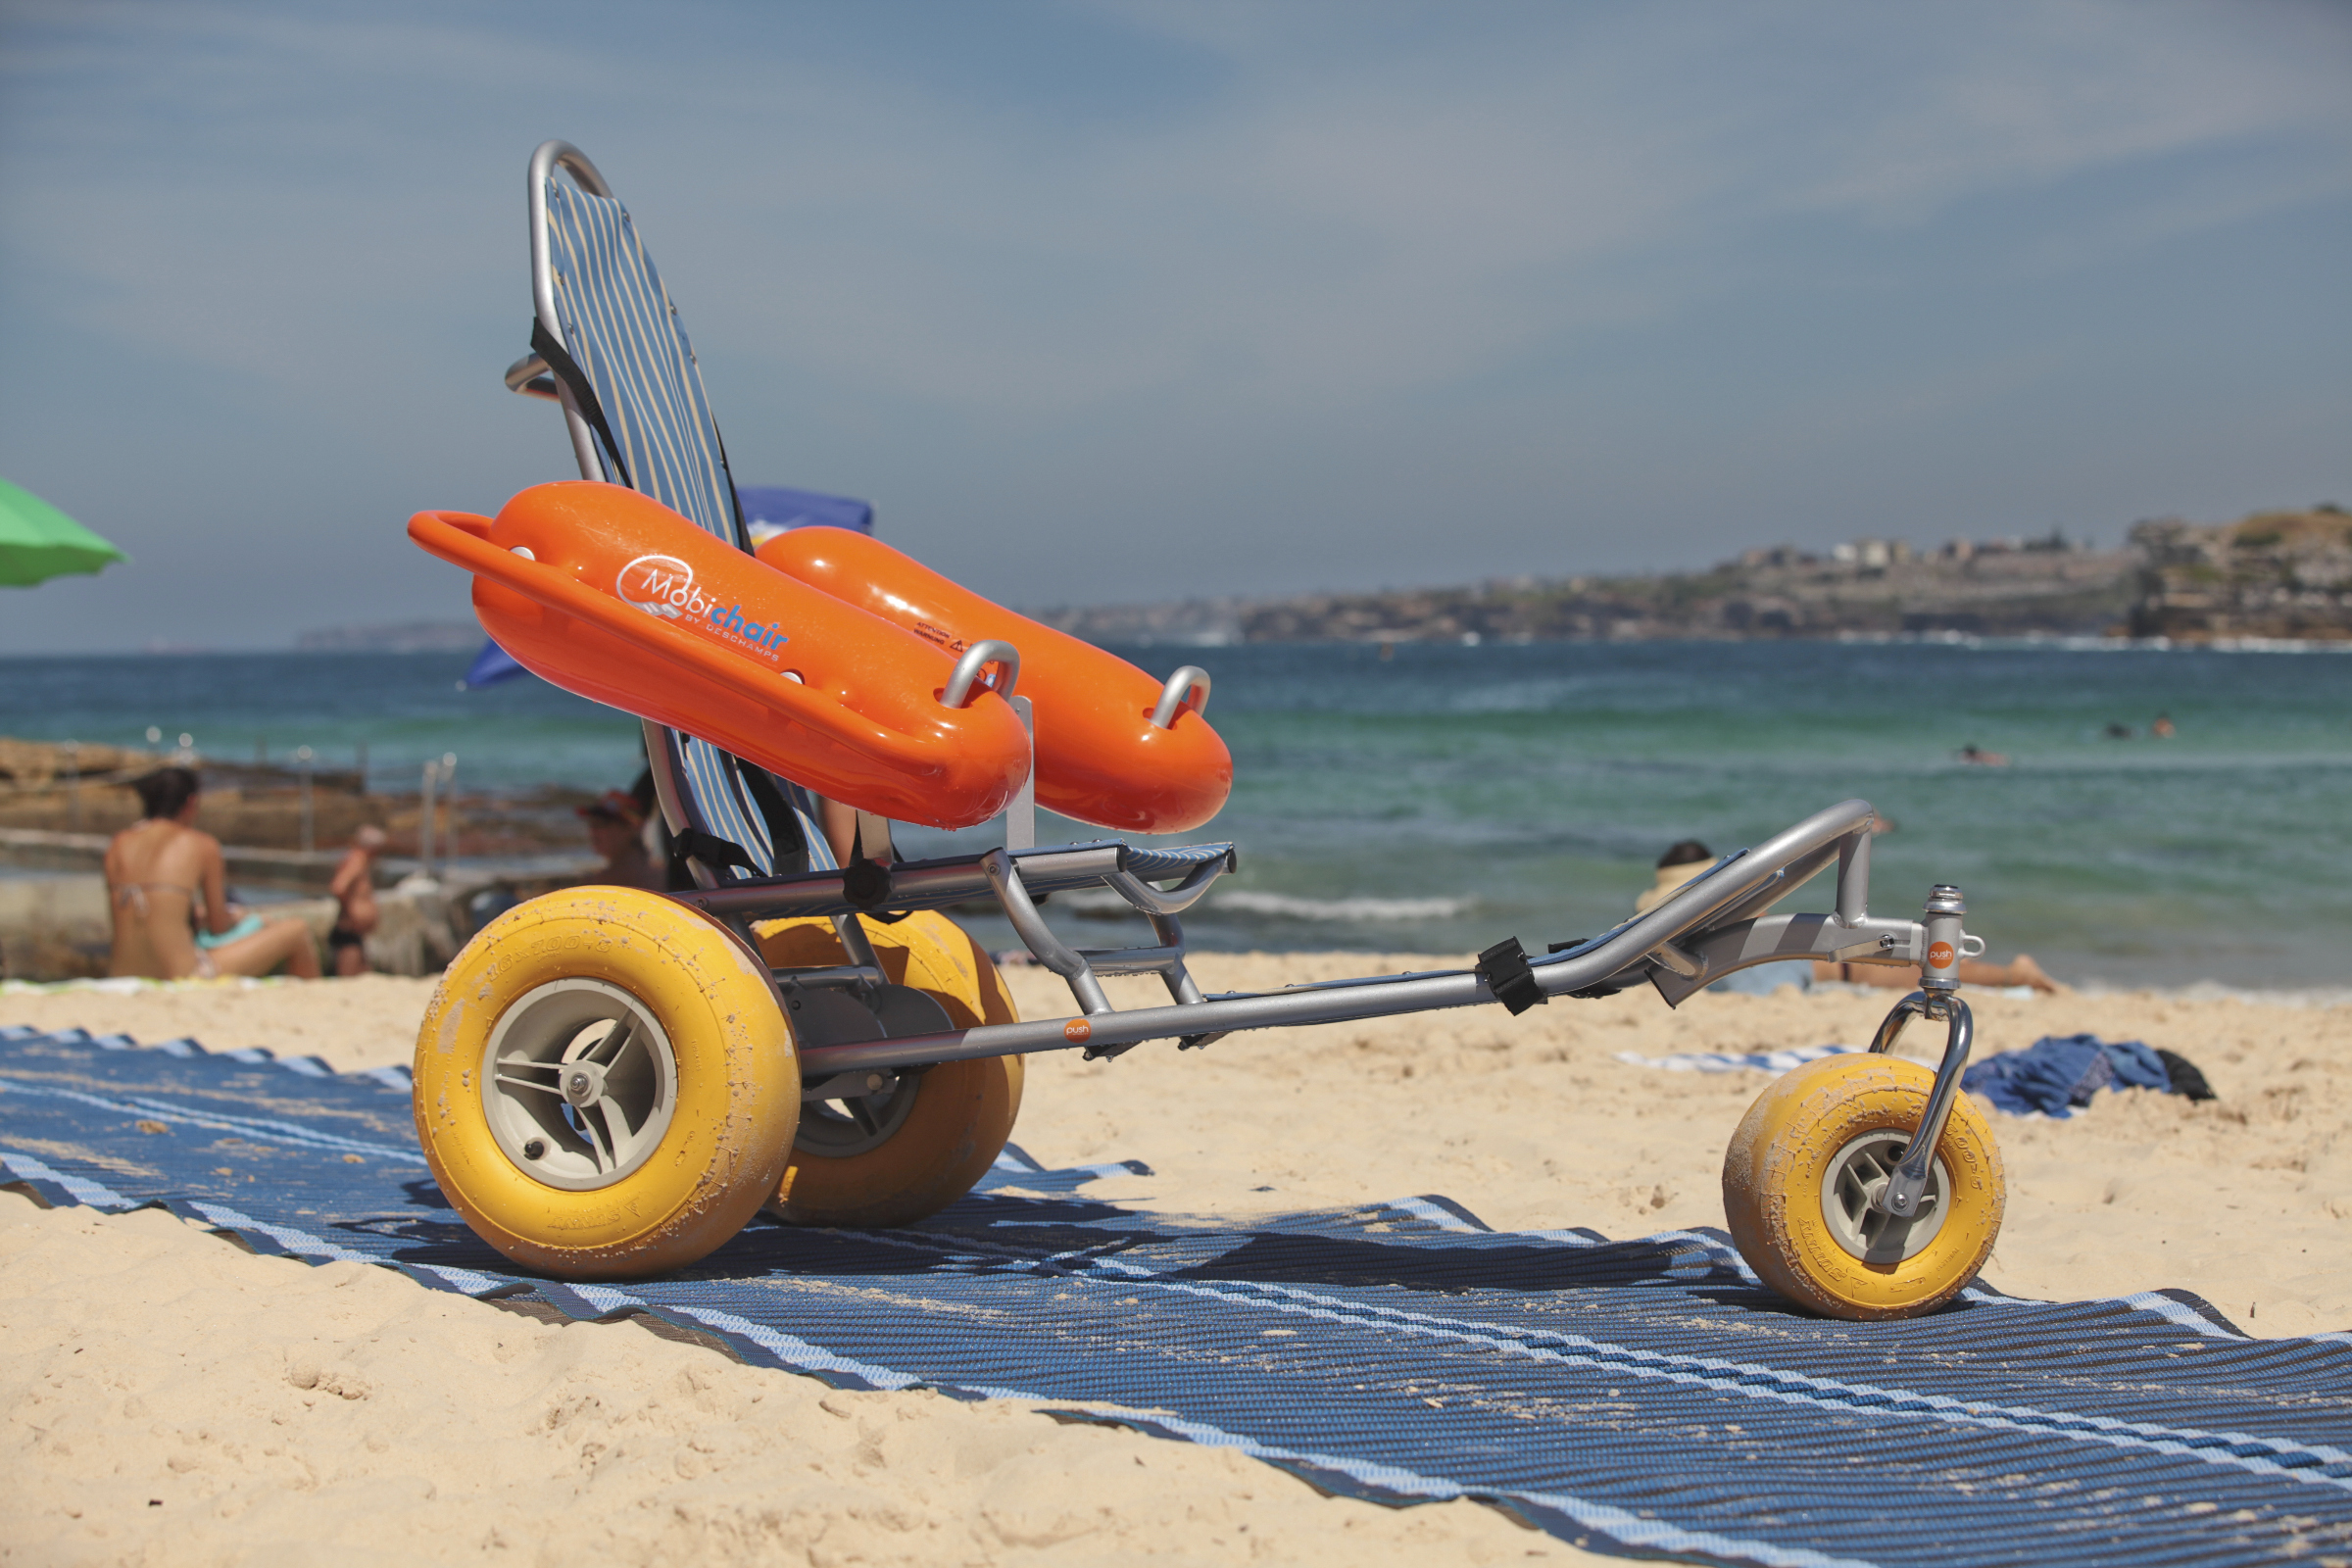 Mobi-Chair (and Mobi-Mat) on Bondi Beach, Sydney, Australia